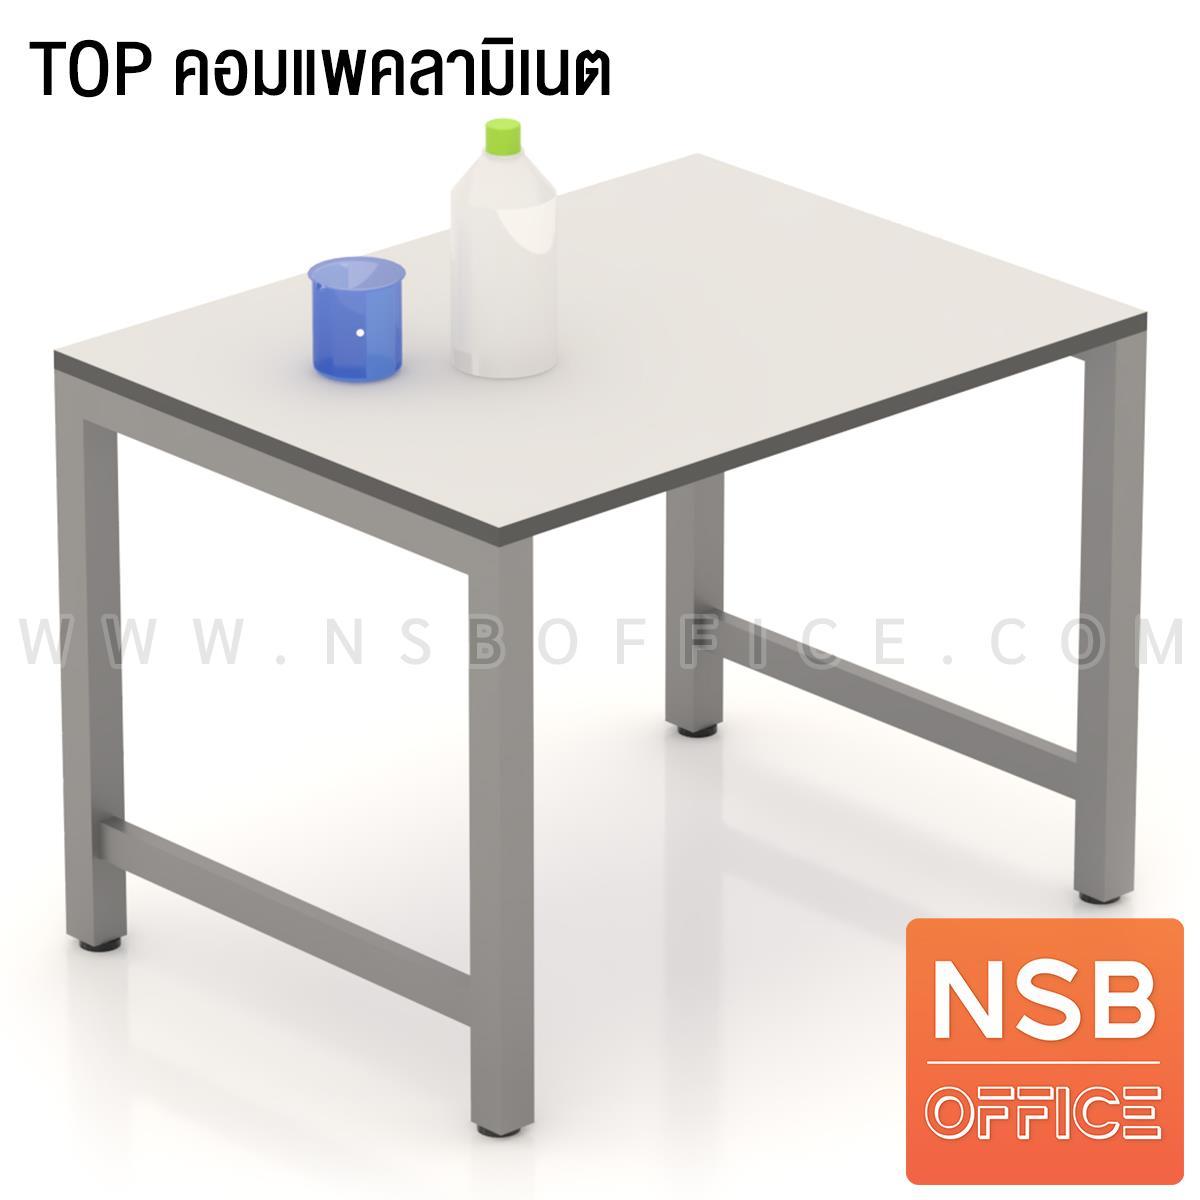 C12A021:โต๊ะปฏิบัติการ  รุ่น Pureflix (เพียวฟลิกซ์) ขนาด 80W, 100W cm. หน้าท็อป HPL และ คอมแพคลามิเนต  ขาเหล็ก